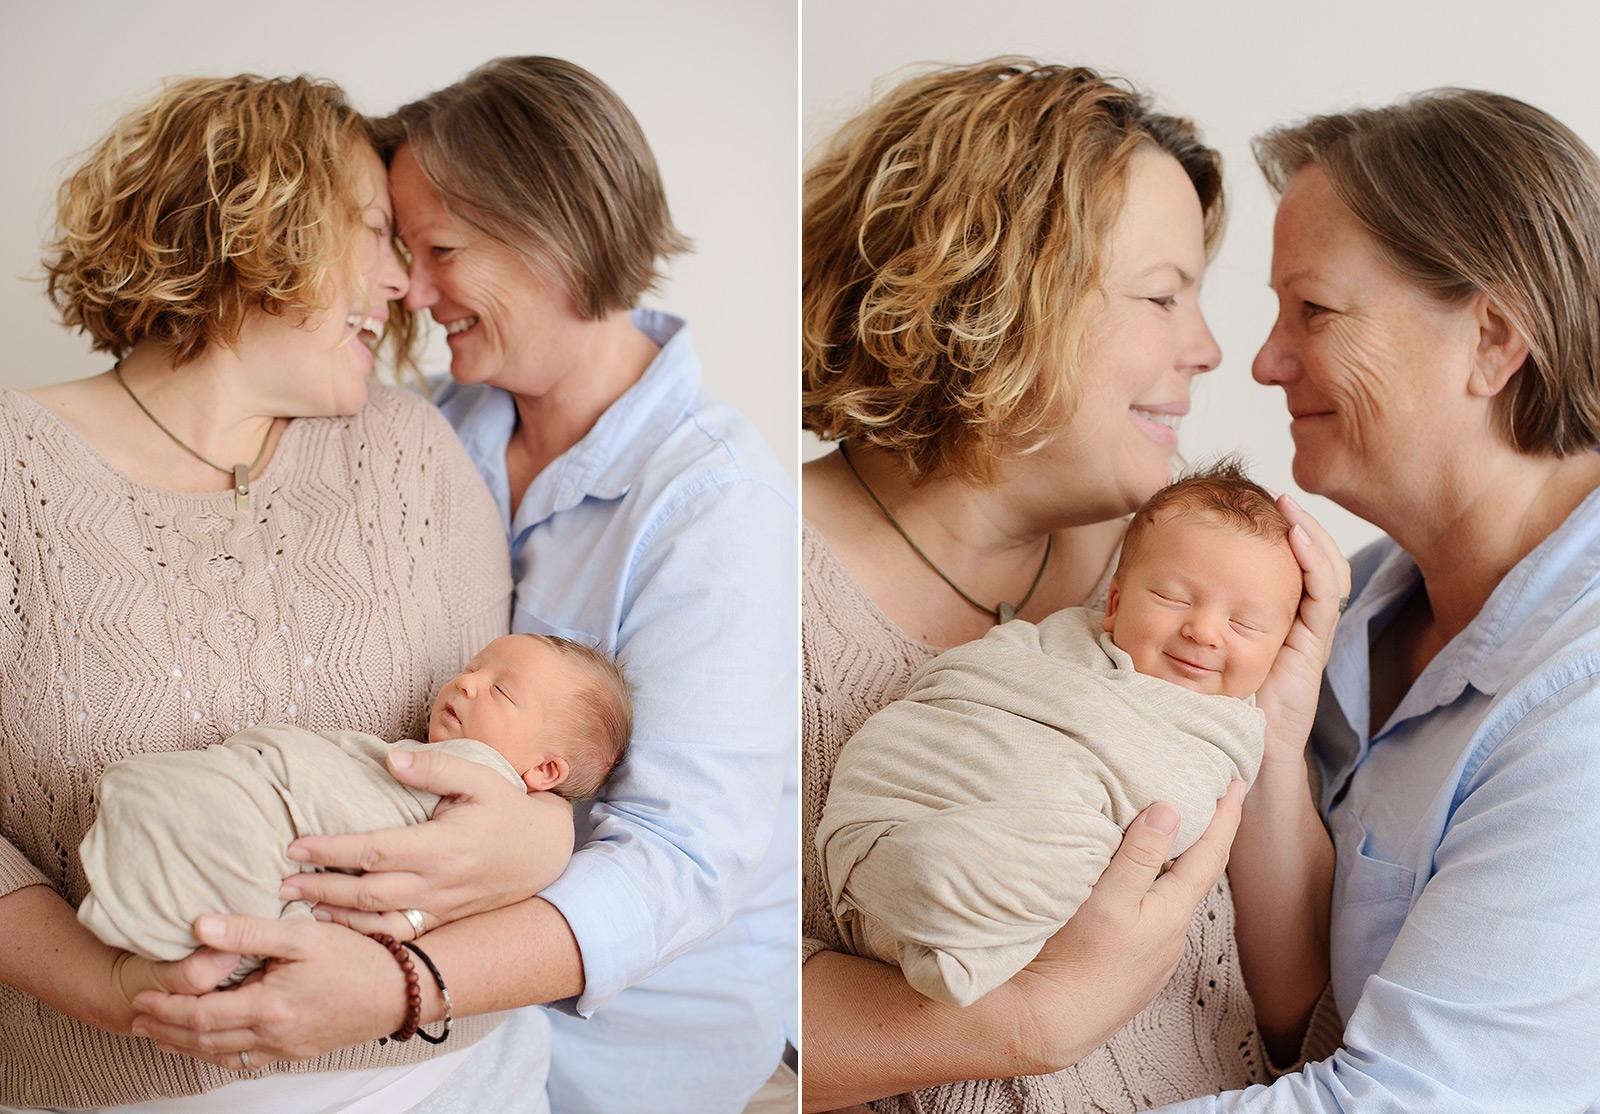 Moms cuddling newborn baby boy and smiling